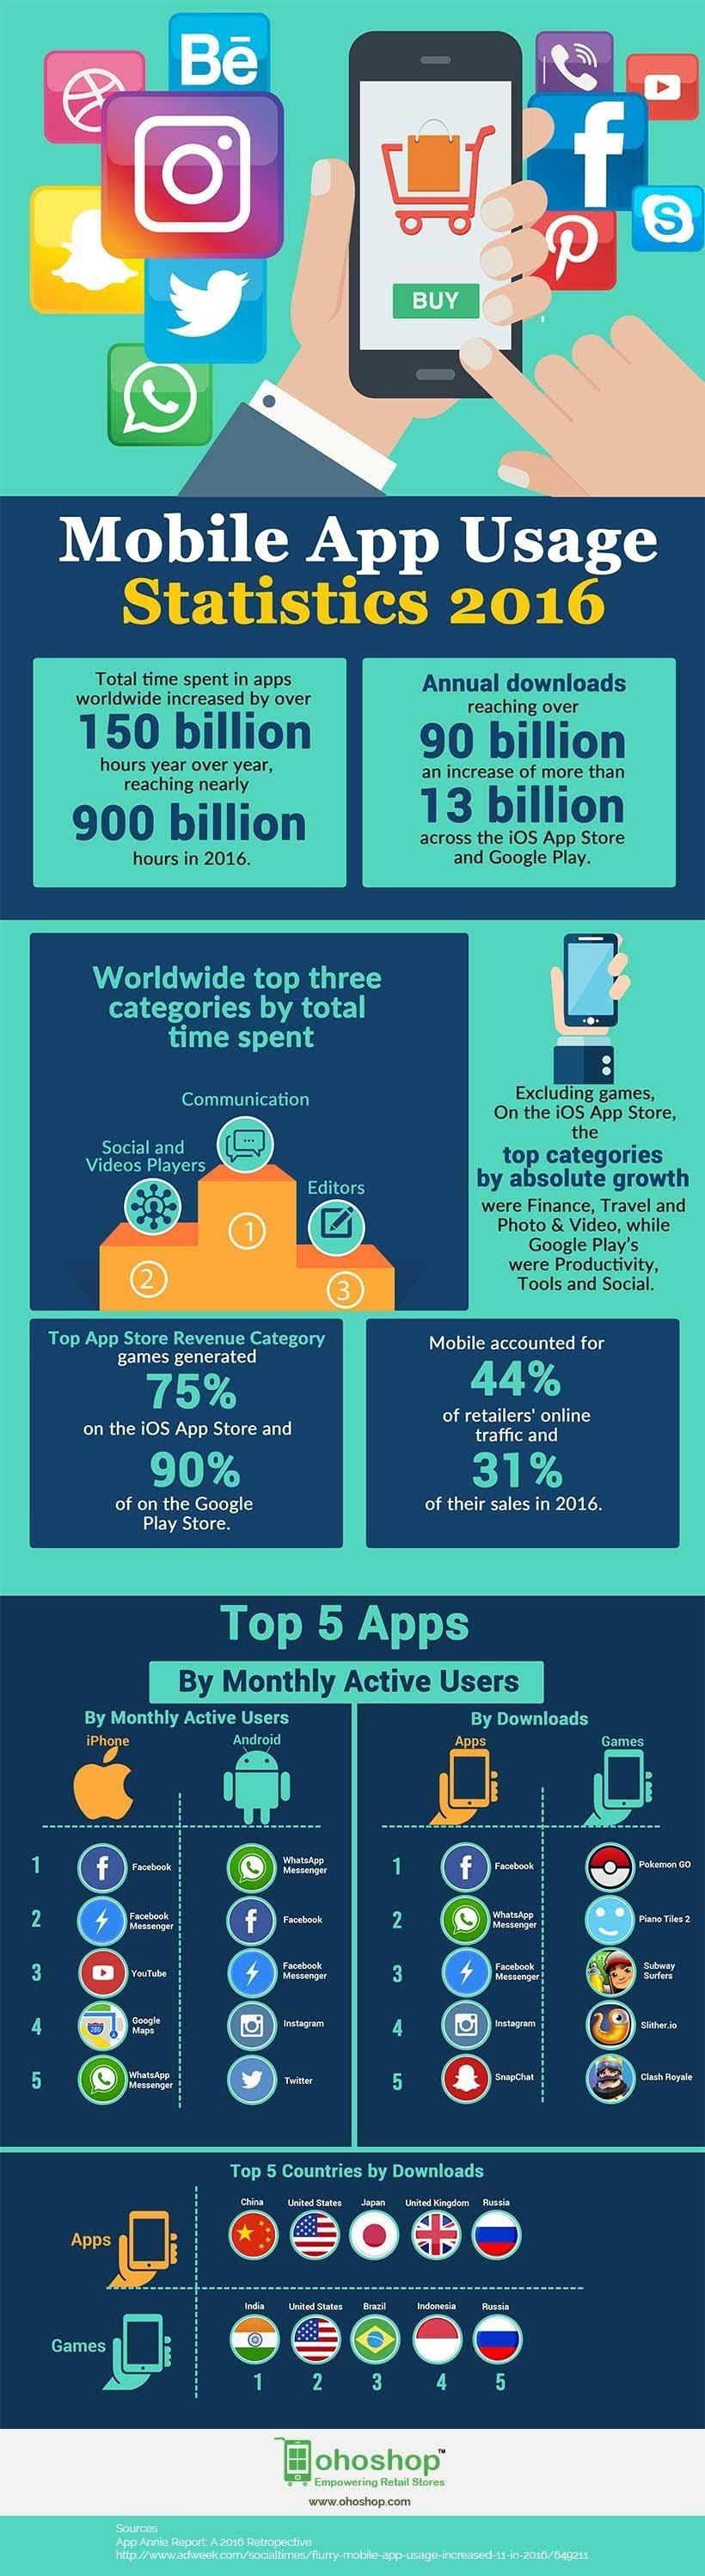 Mobile App Usage Statistics 2016 #infographic